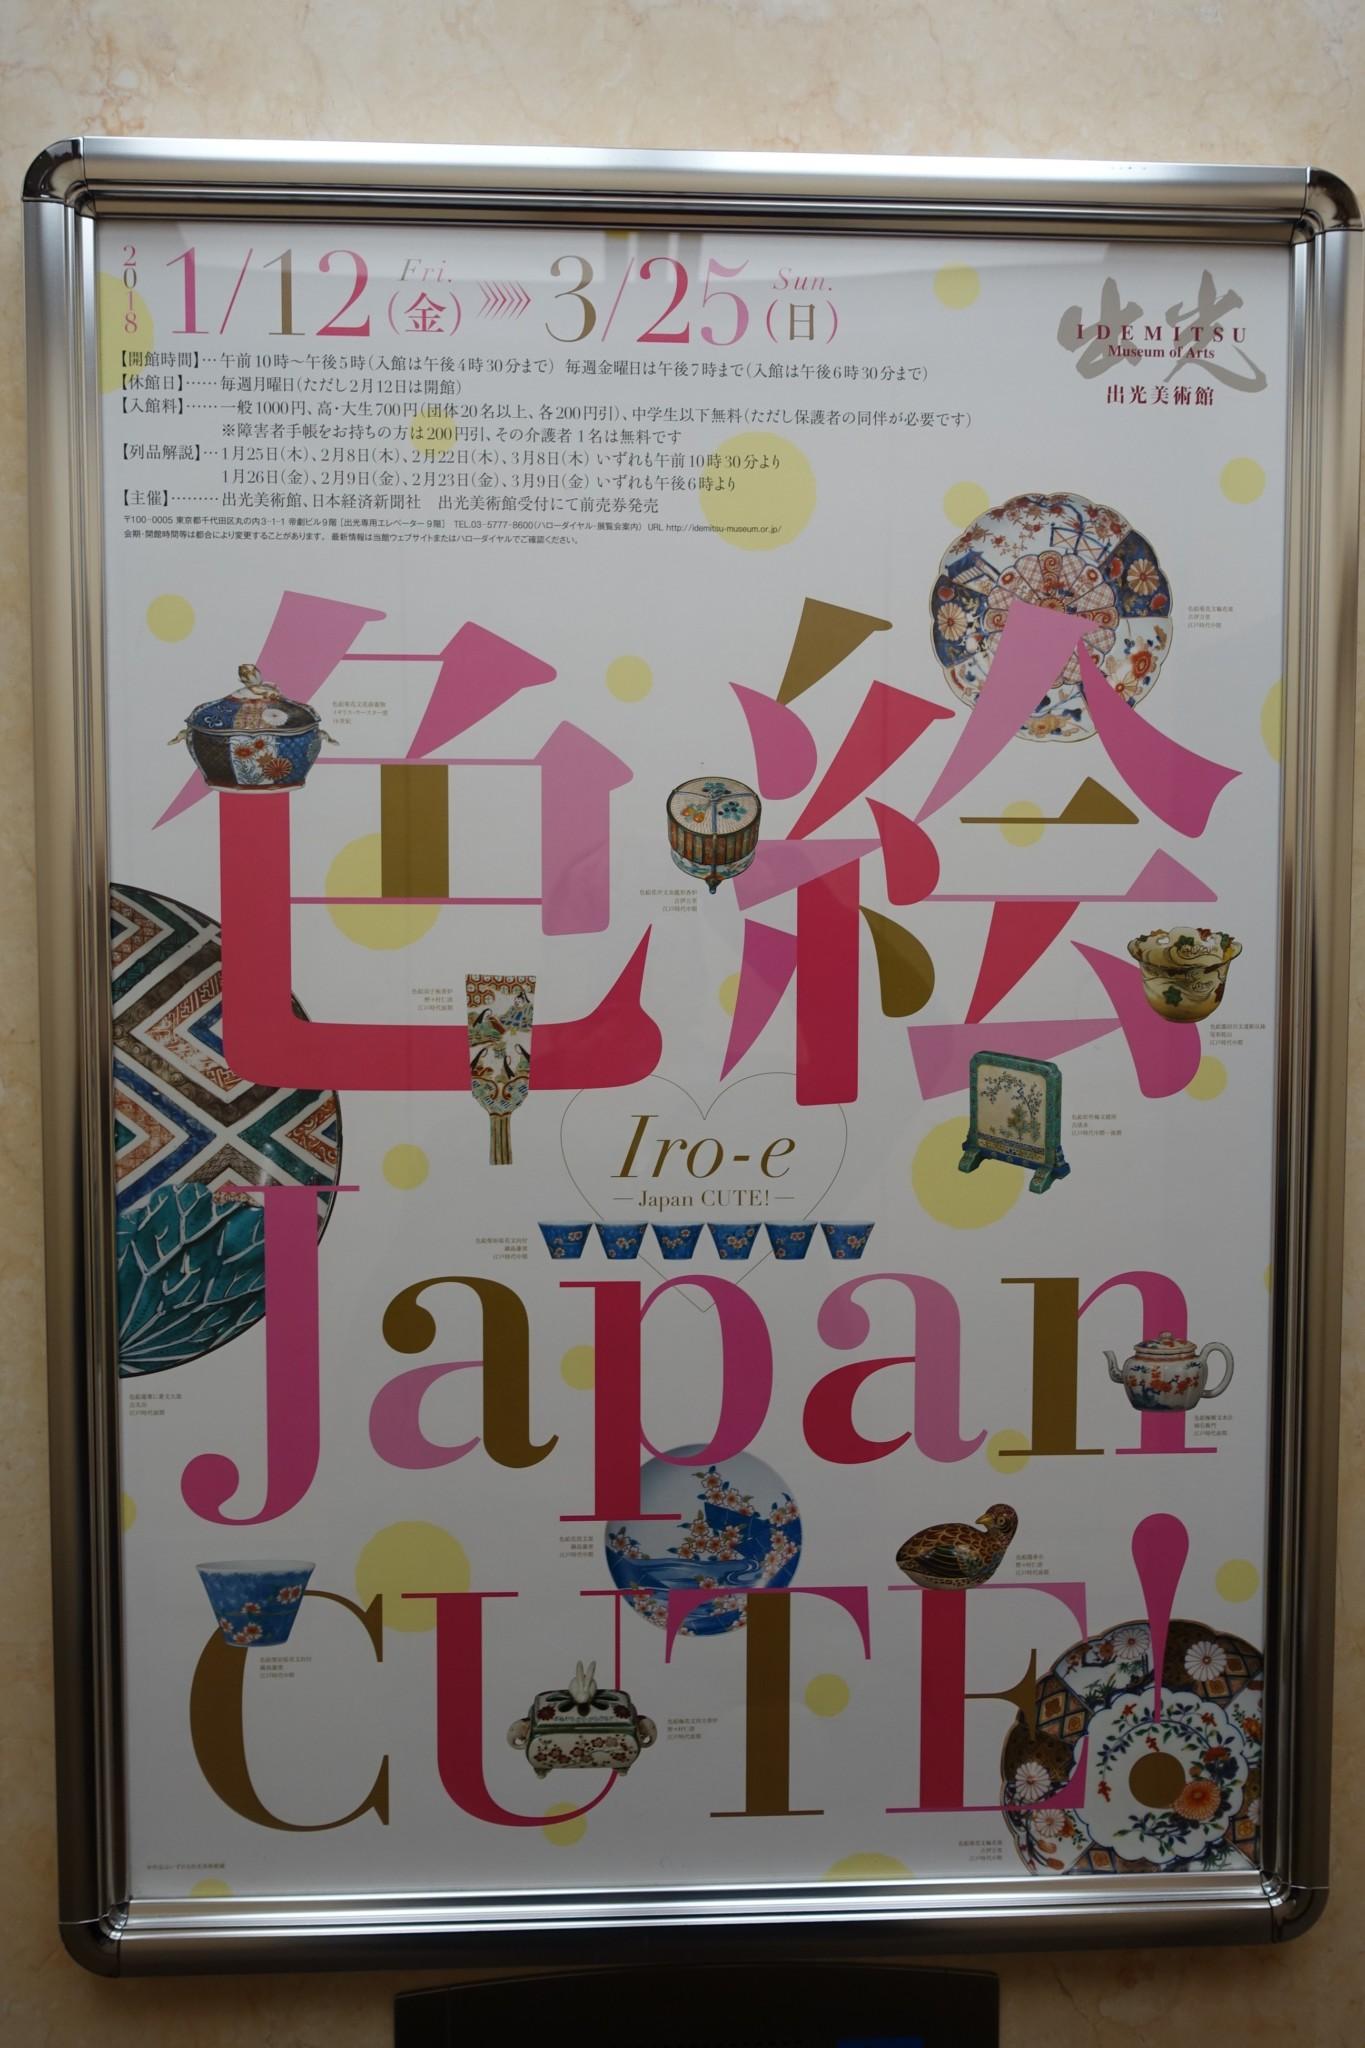 色絵 Japan CUTE !